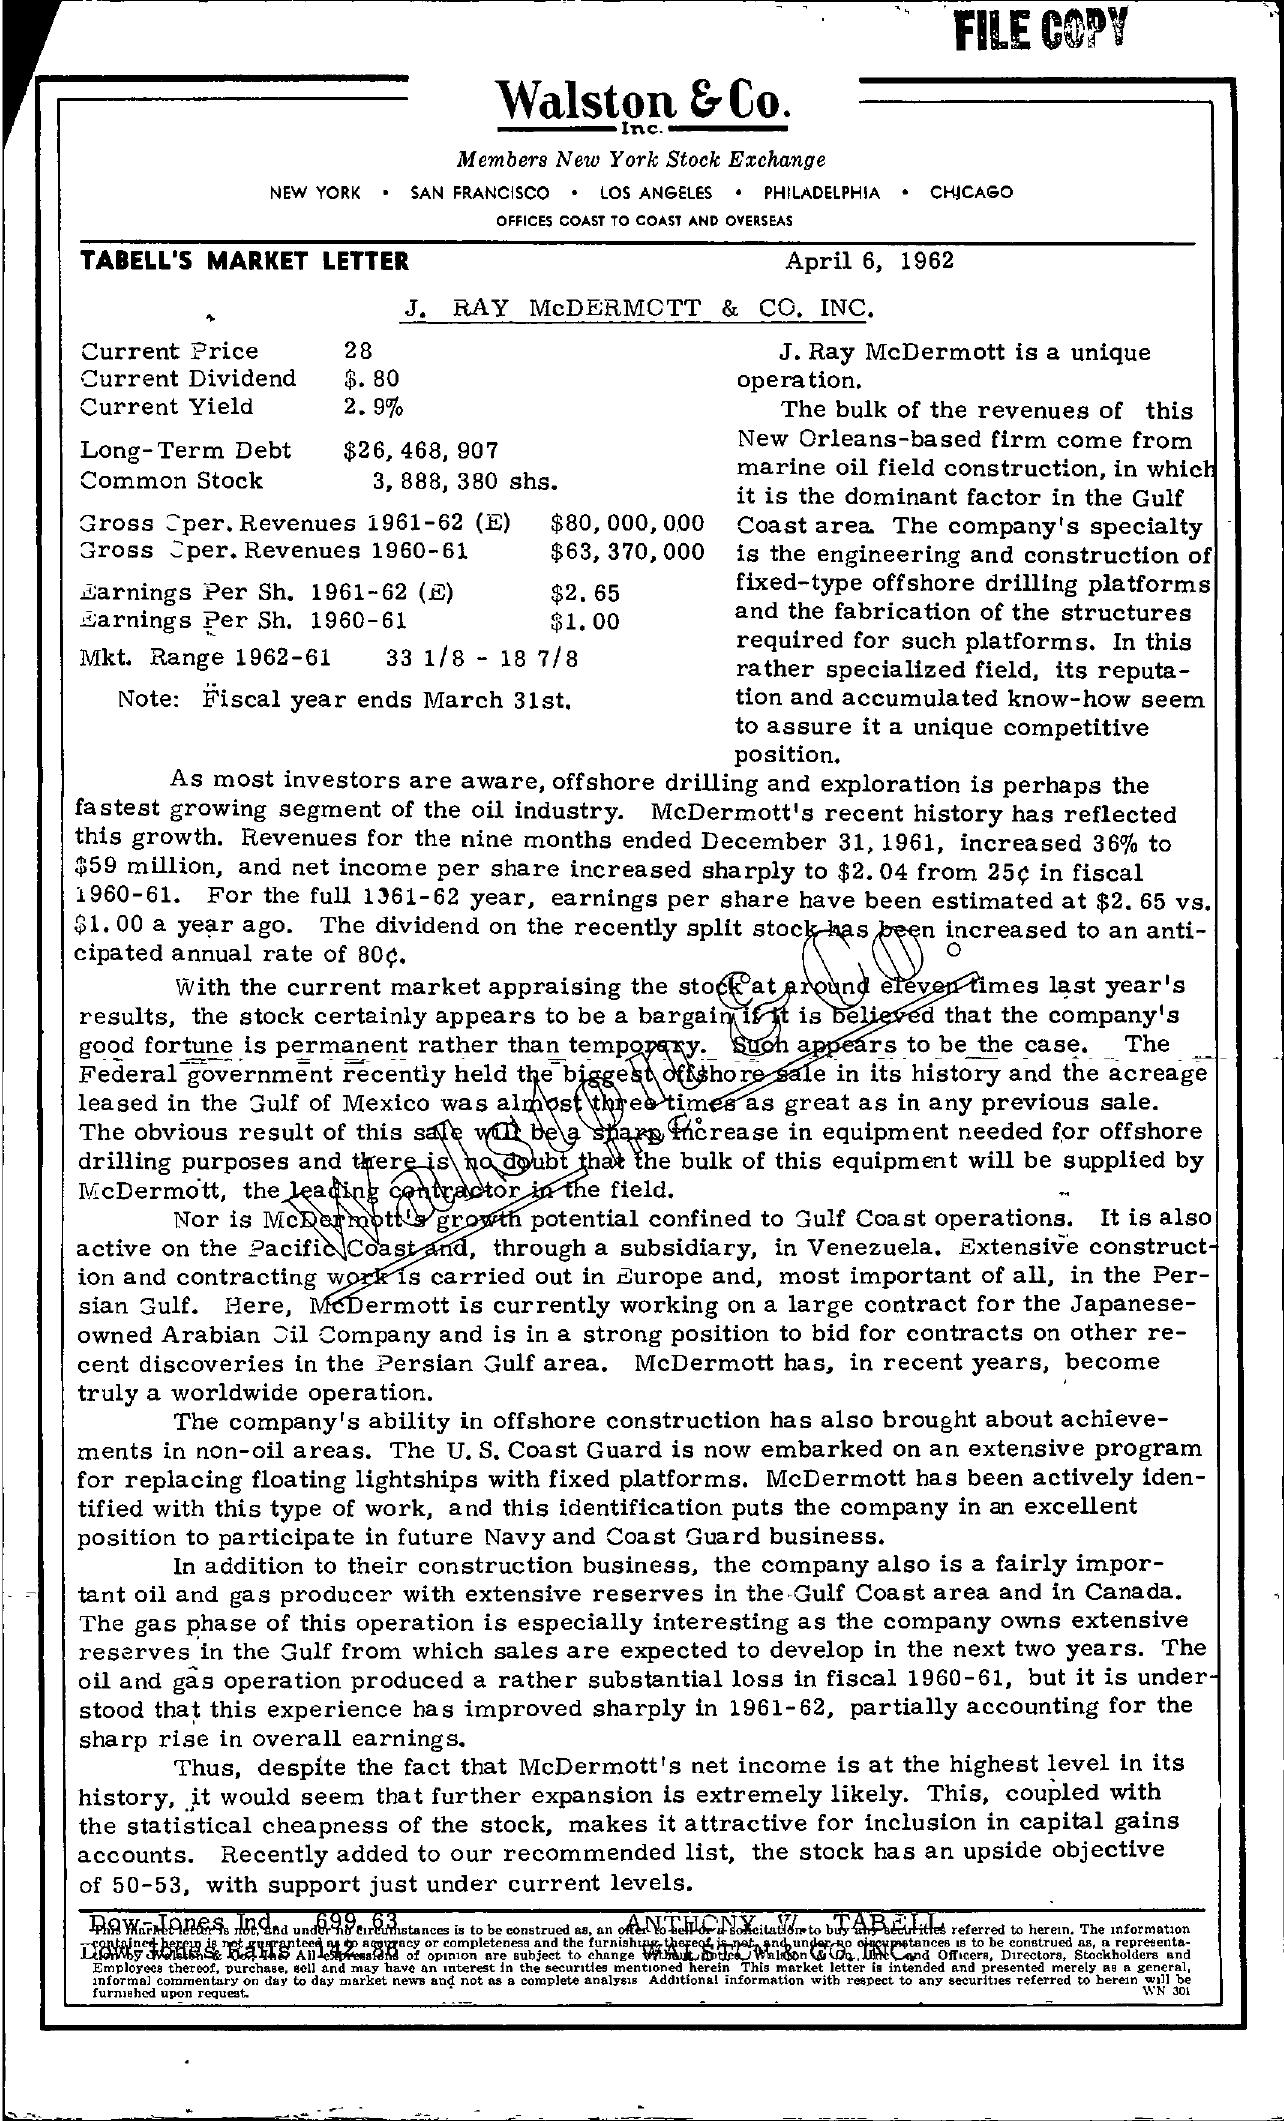 Tabell's Market Letter - April 06, 1962